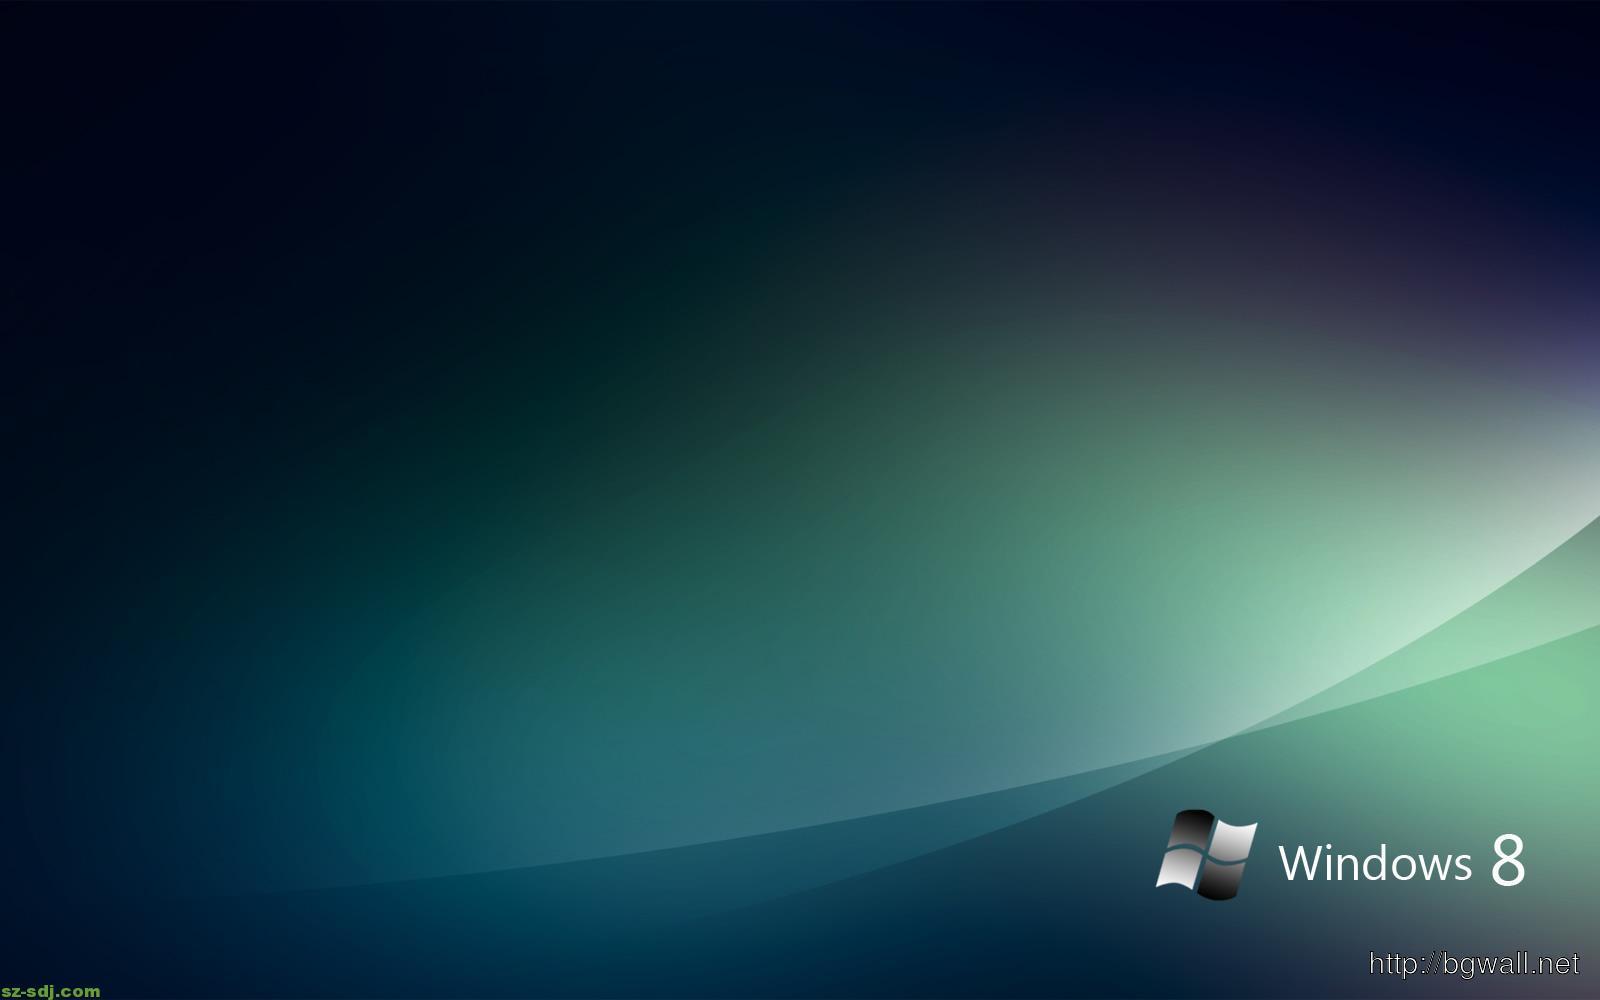 <b>Windows 8 Wallpaper</b> 1920x1080 - WallpaperSafari